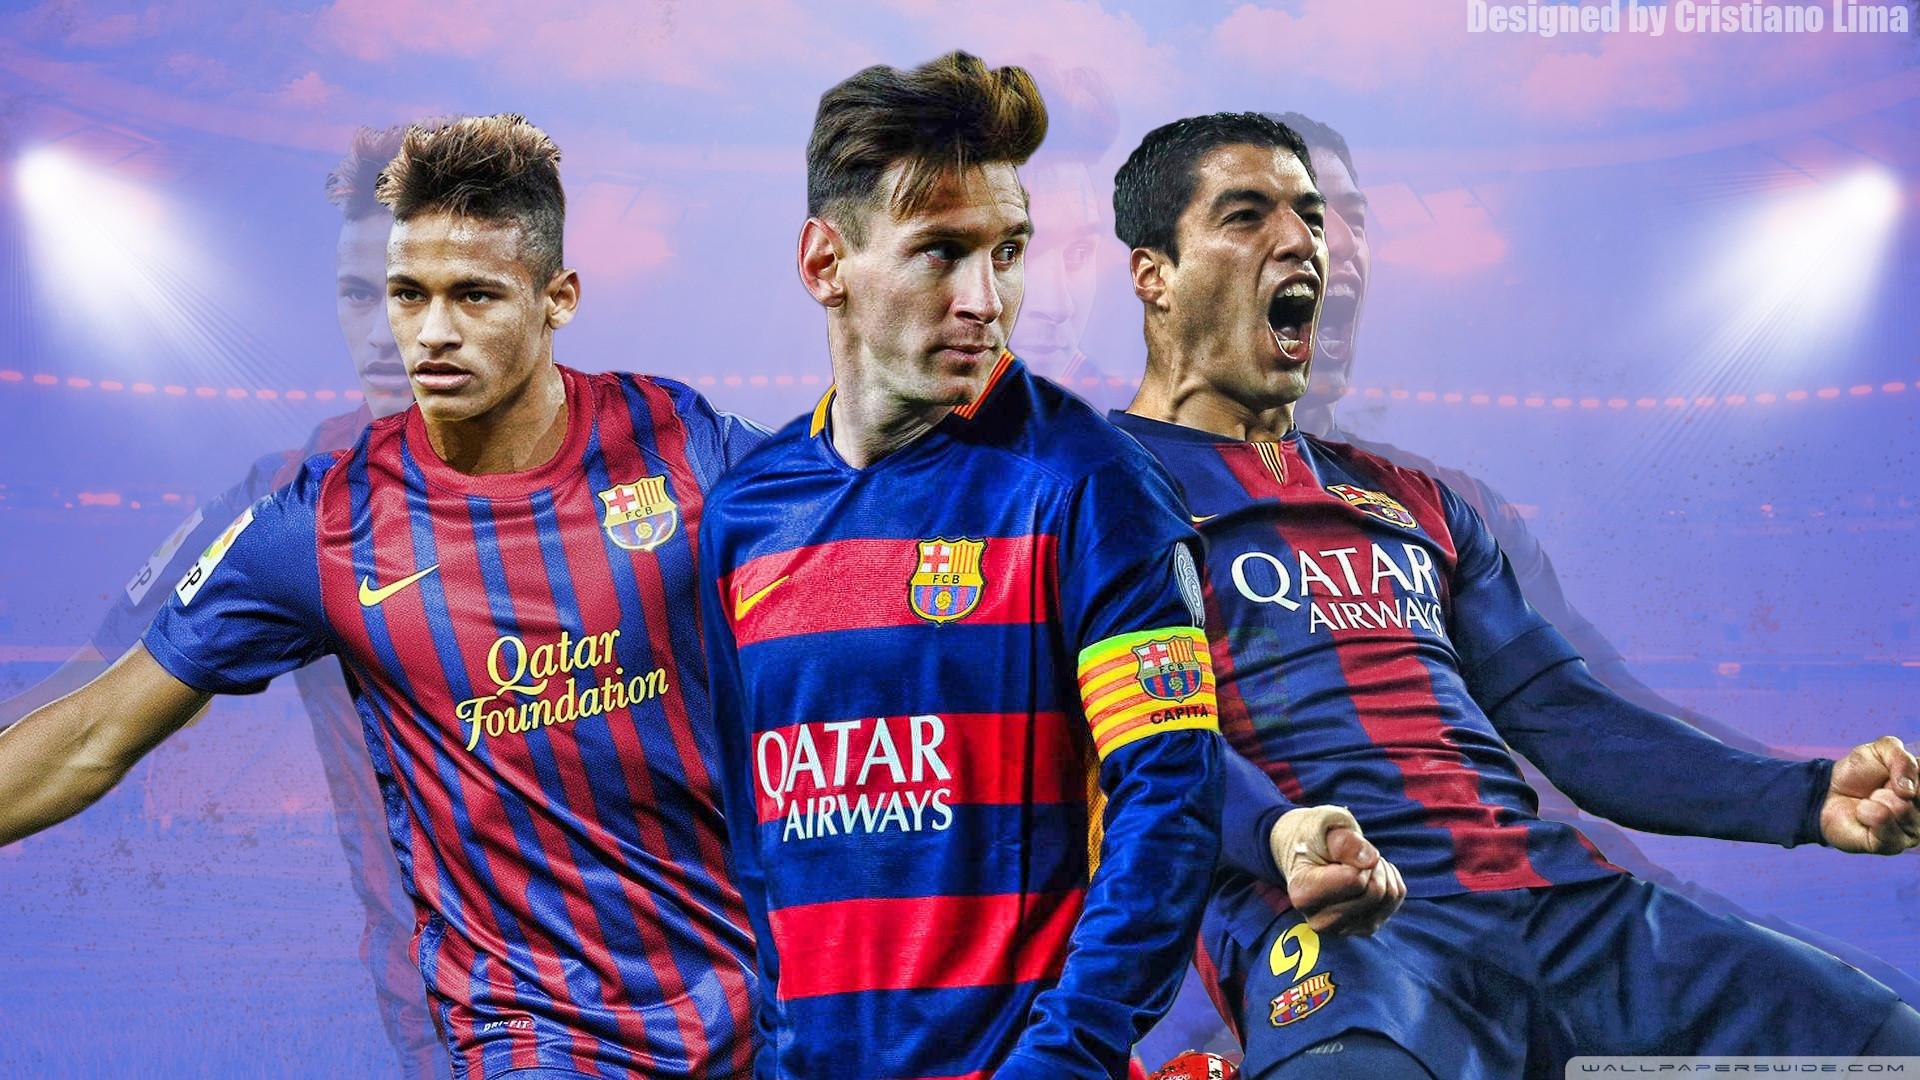 … Barca Neymar Messi Wallpaper Barcelona Trio – Messi, Suarez And Neymar  Hd Desktop Wallpaper …